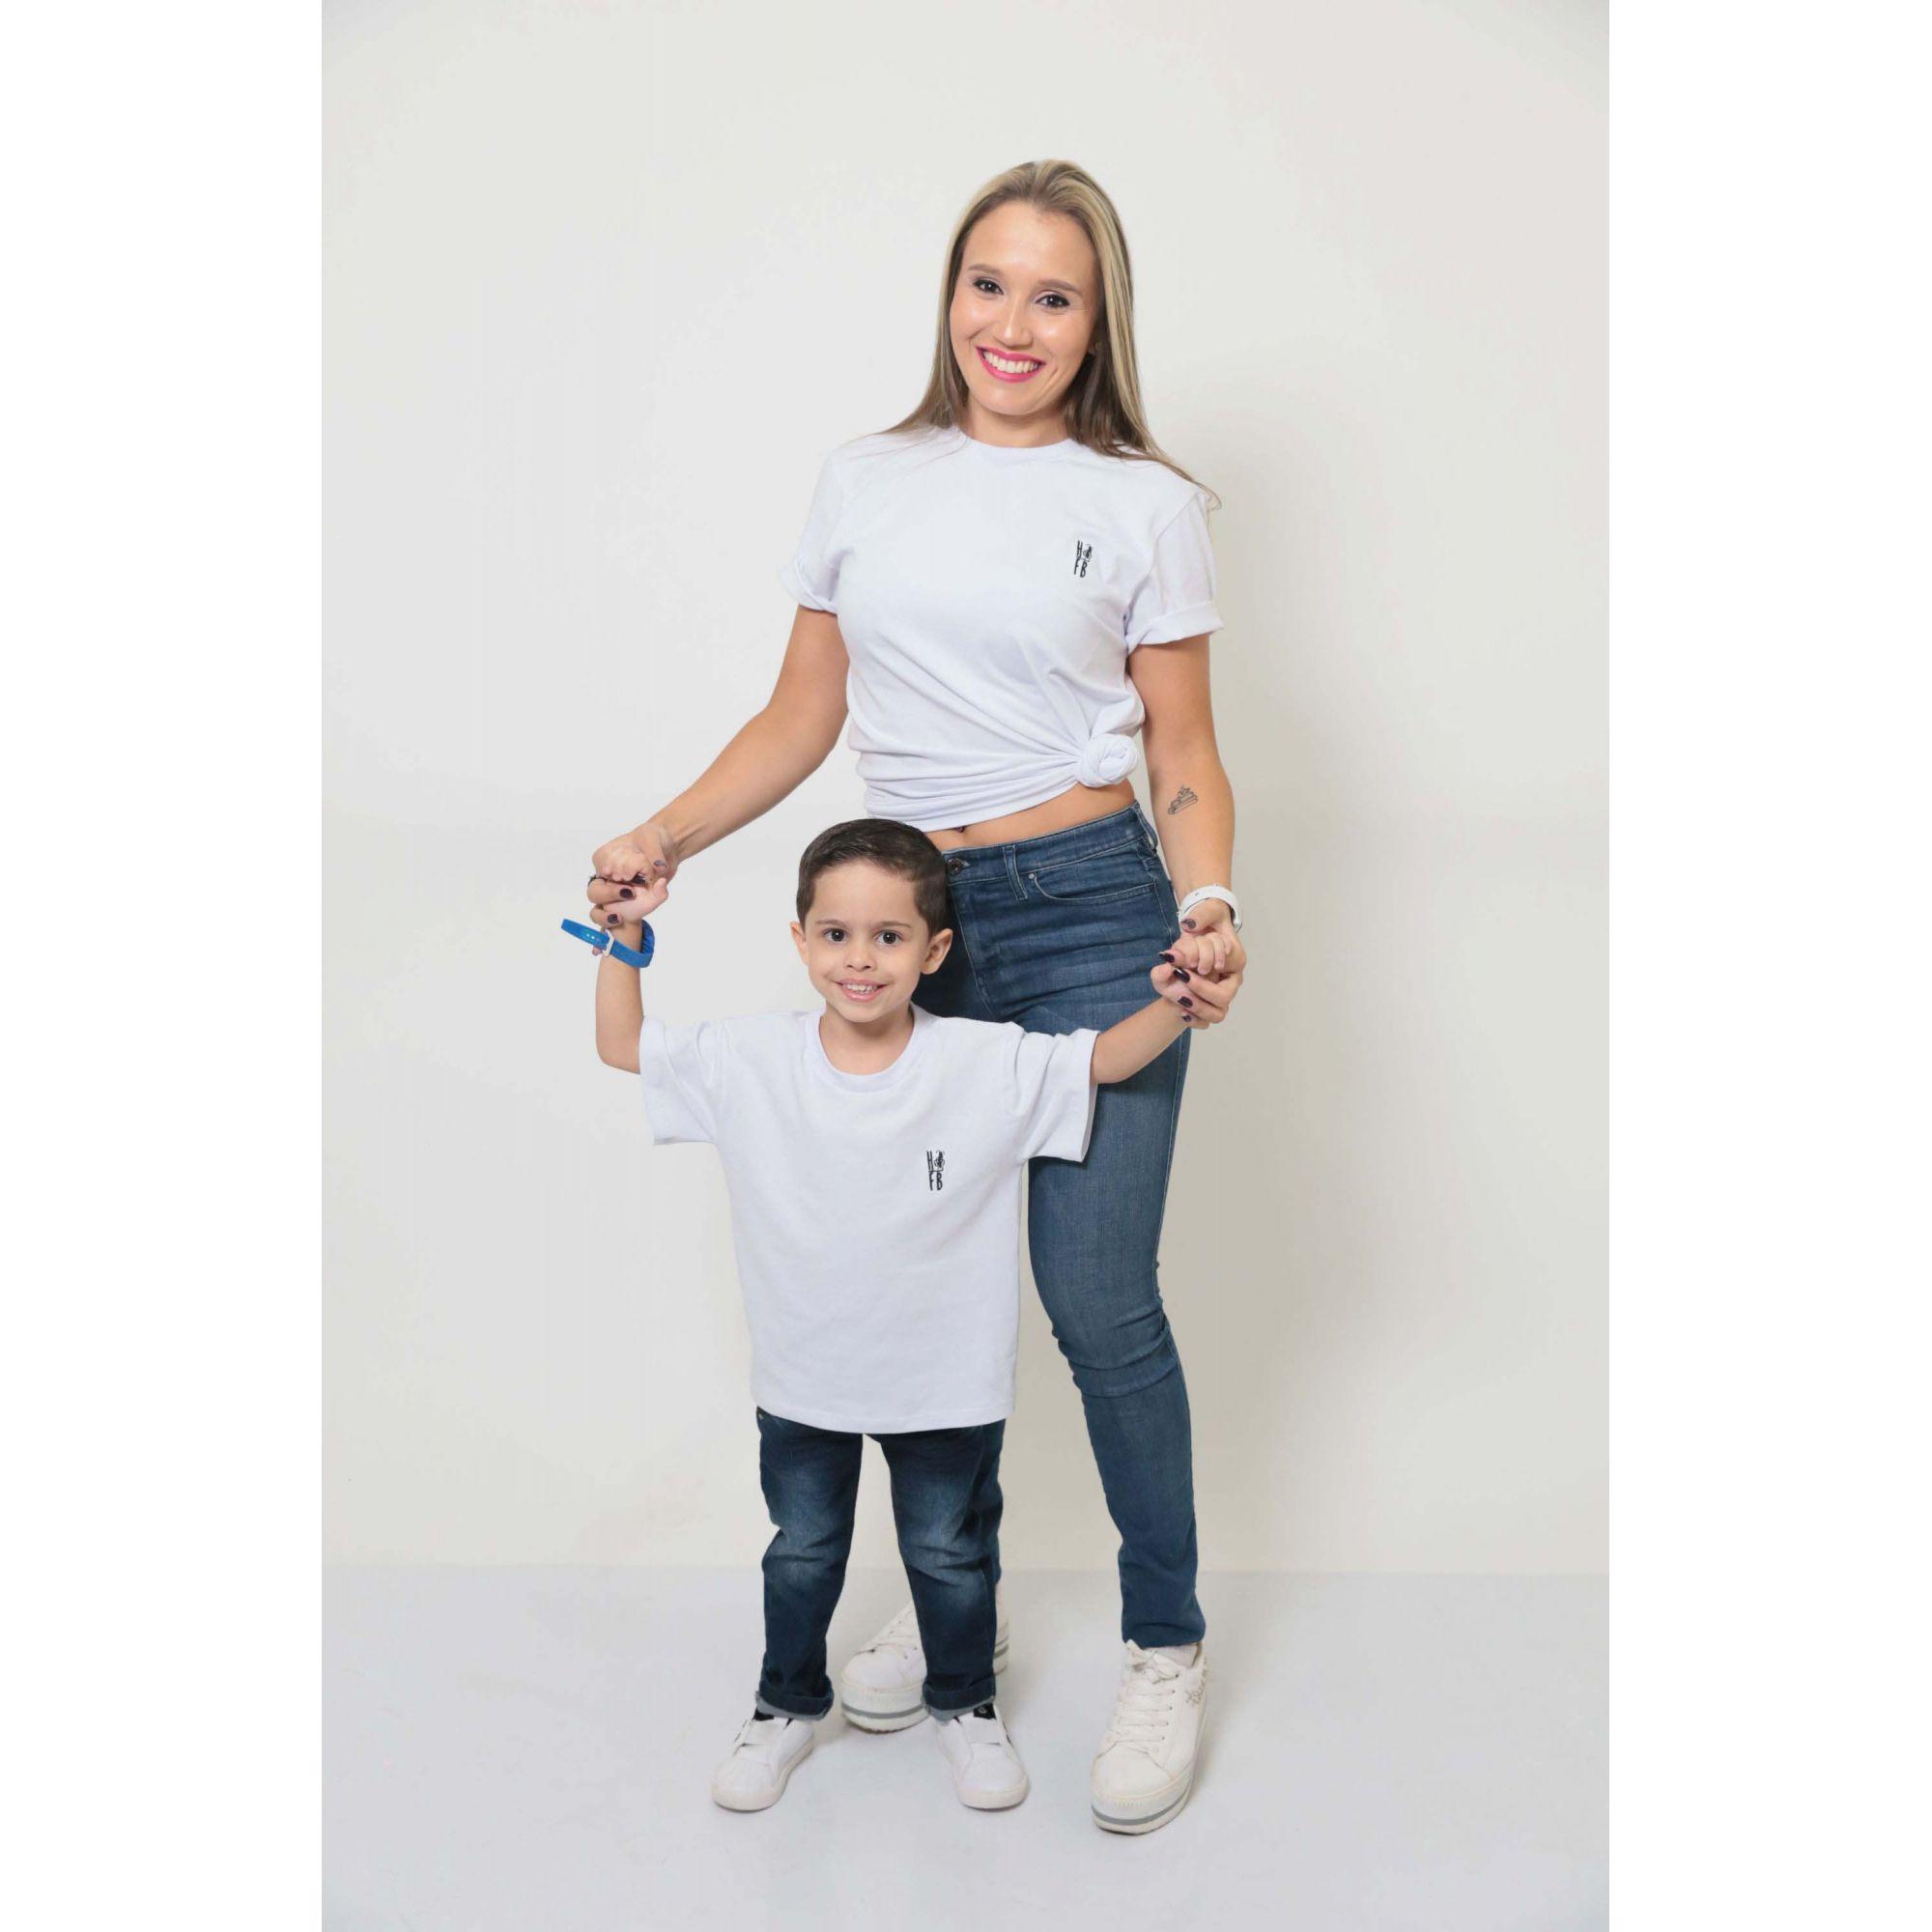 MÃE E FILHO > Kit 02 Peças T-Shirts - Branca [Coleção Tal Mãe Tal Filho]